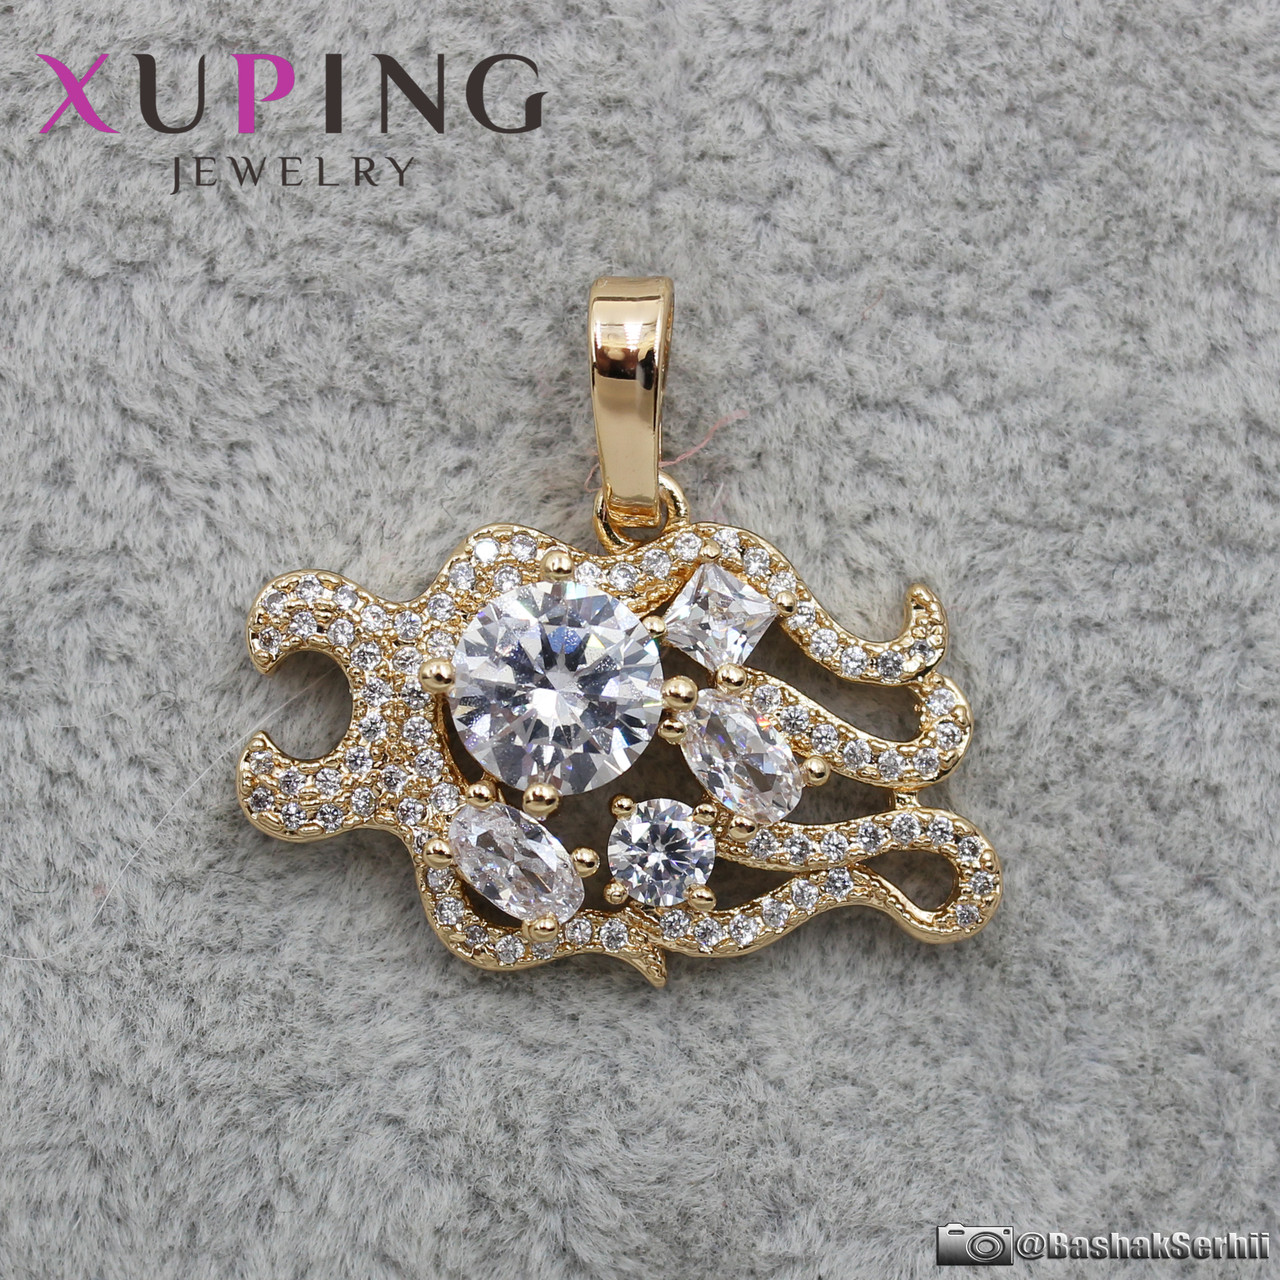 Кулон женский Знаки Зодиака Лев Xuping Jewelry (позолота) - 1114427018